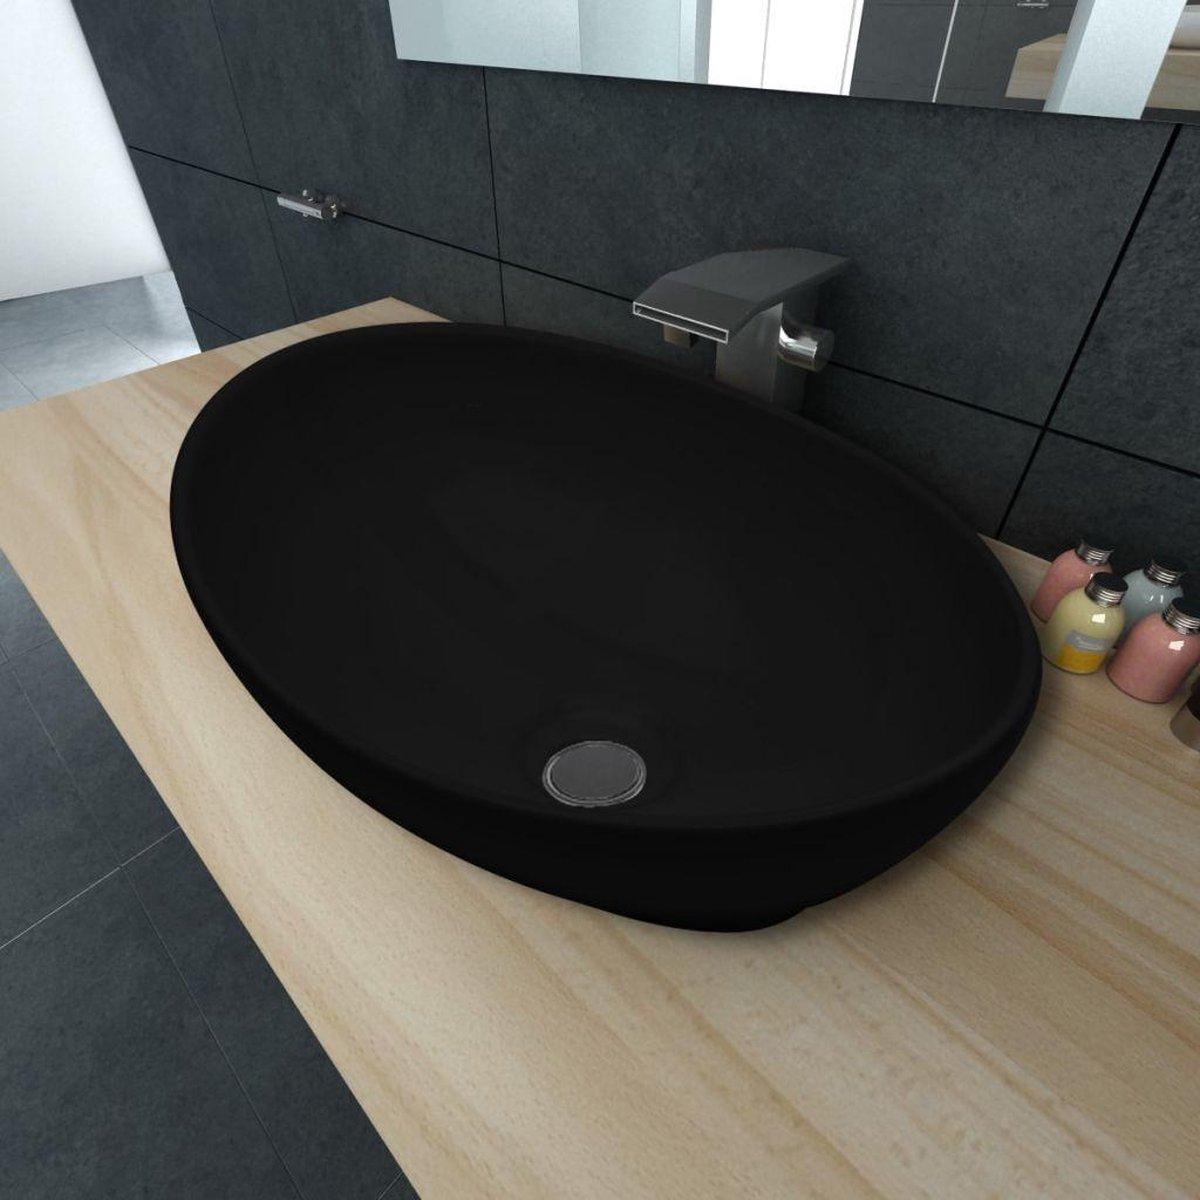 Luxe keramische wasbak ovaal 40 x 33 cm (zwart)